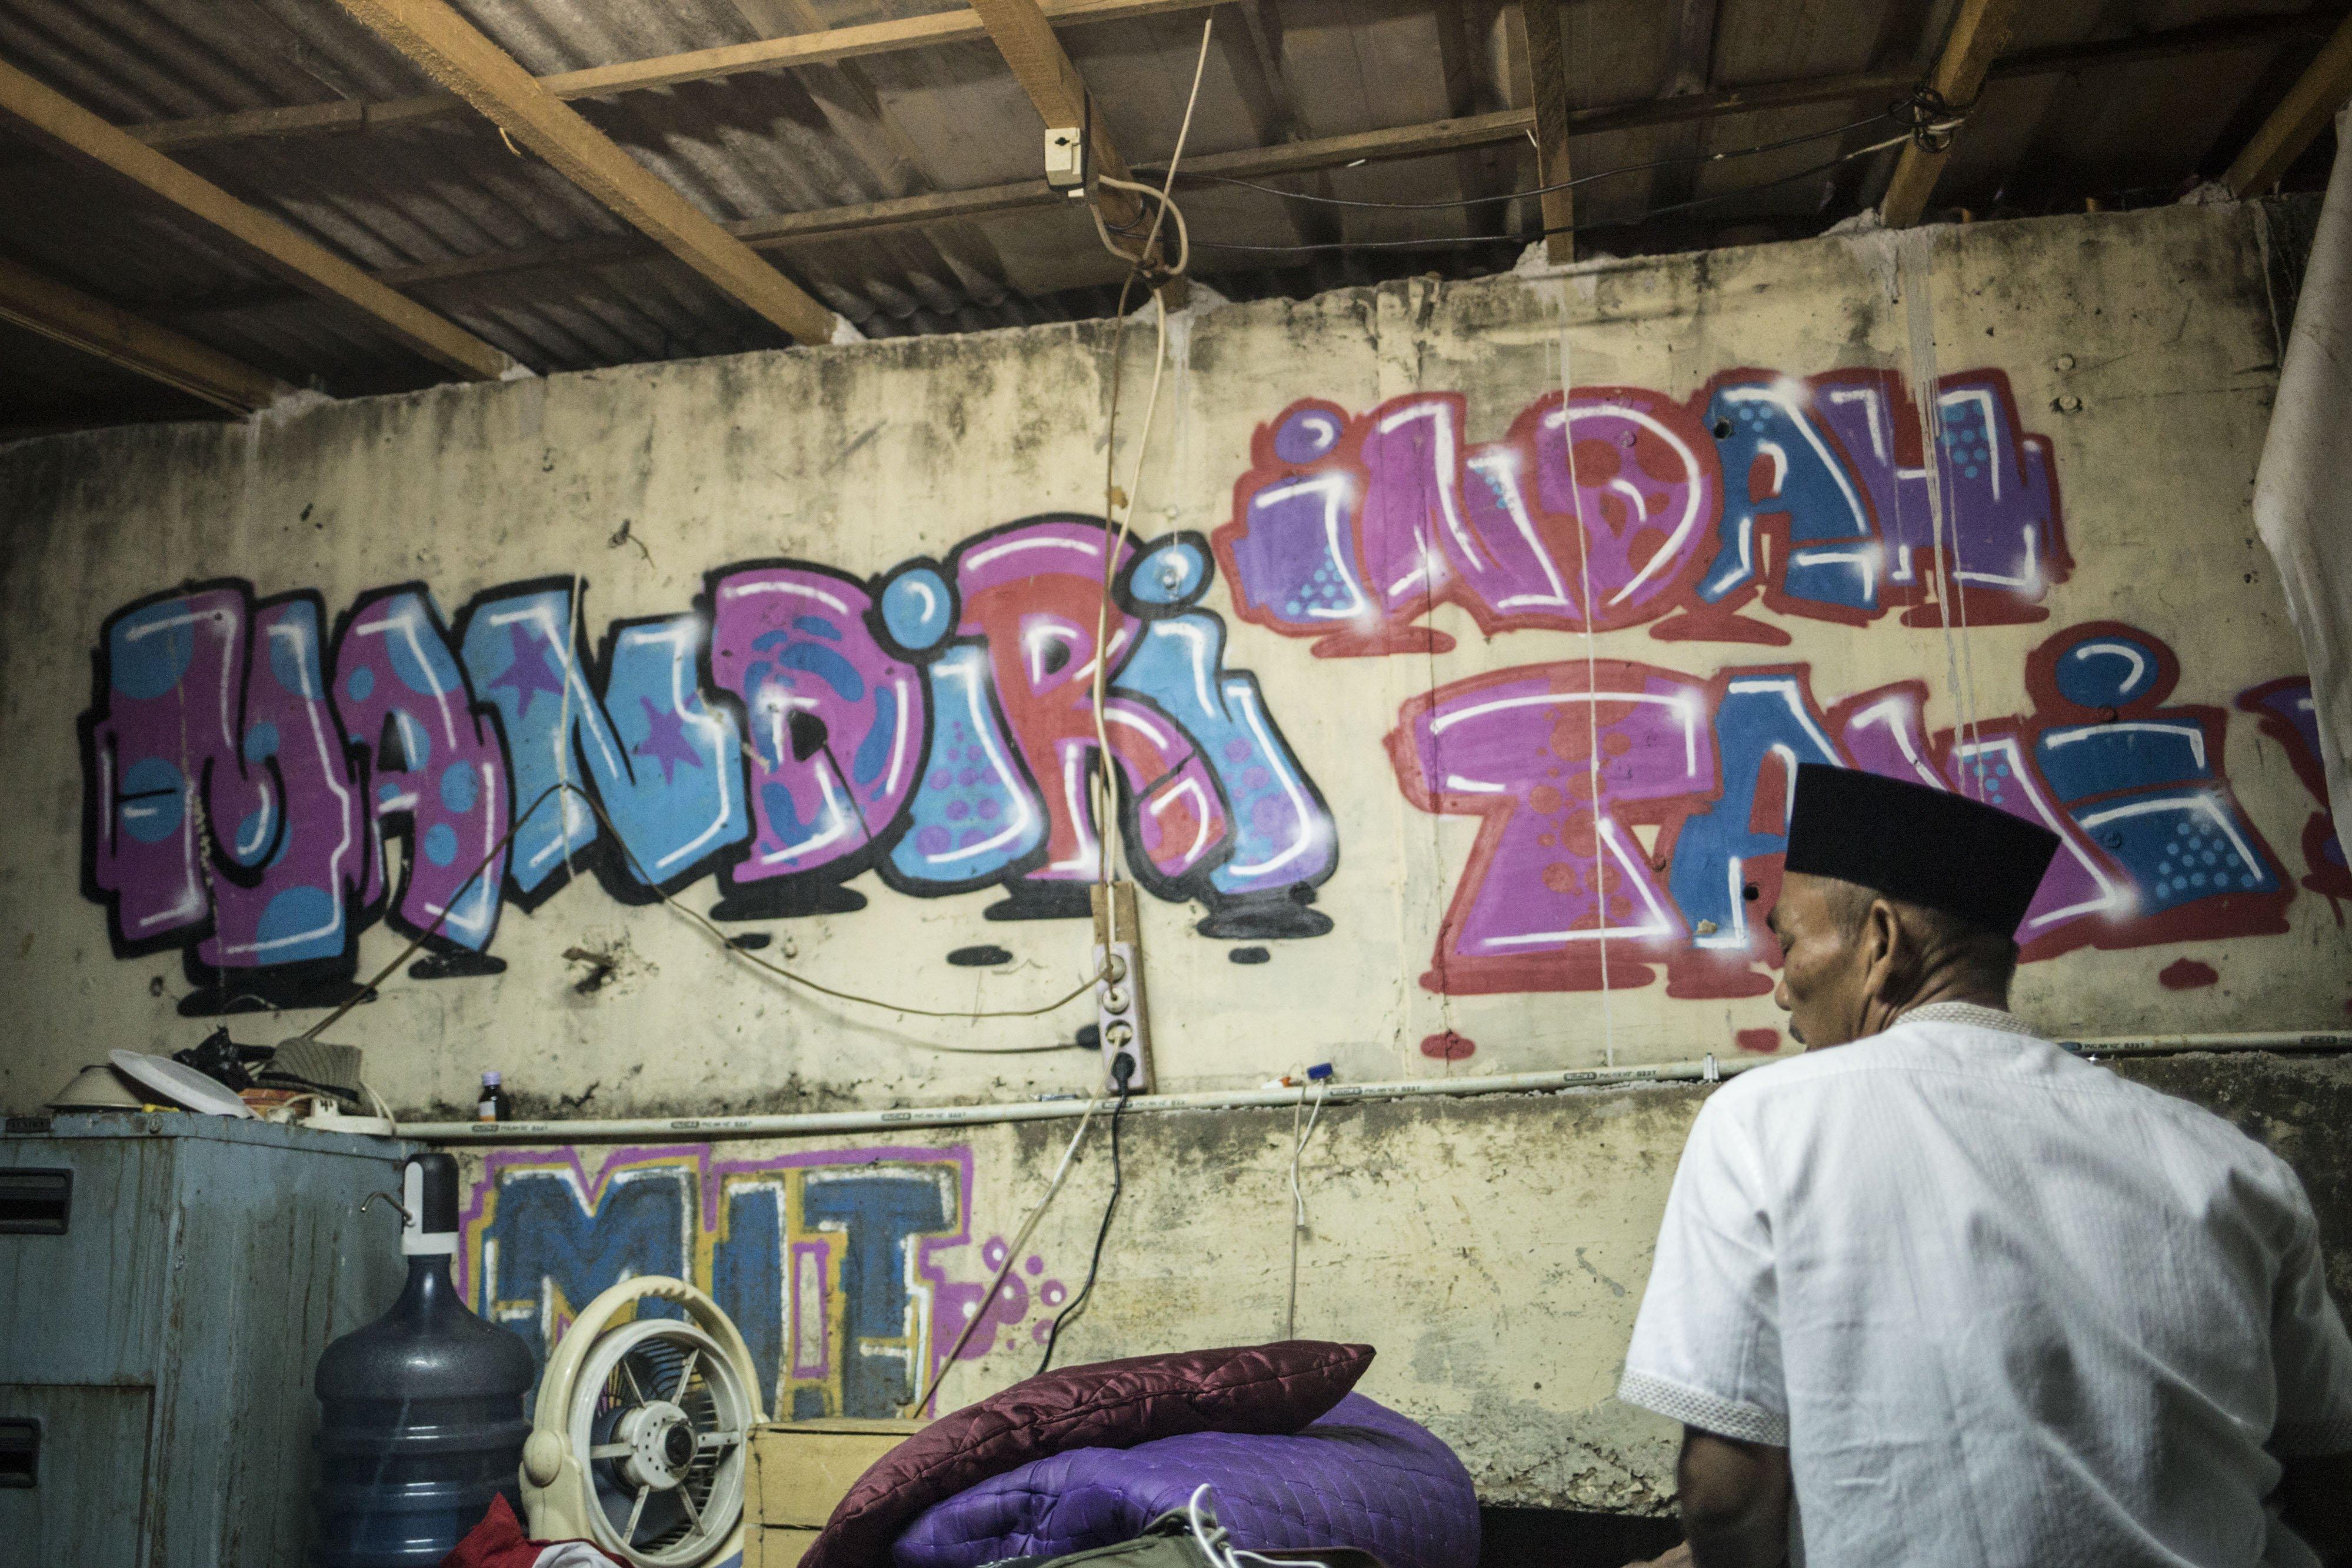 Andi (50) beribadah di bantaran Sungai Ciliwung, Petamburan, Jakarta Pusat, Minggu (12/7/2020). Selama enam tahun ia memanfaatkan lahan bantaran kali Ciliwung untuk bertani bersama kelompok Mandiri Indah Tani sebagai upaya memenuhi kebutuhan hidup diatas keterbatasan lahan dan kemampuan.